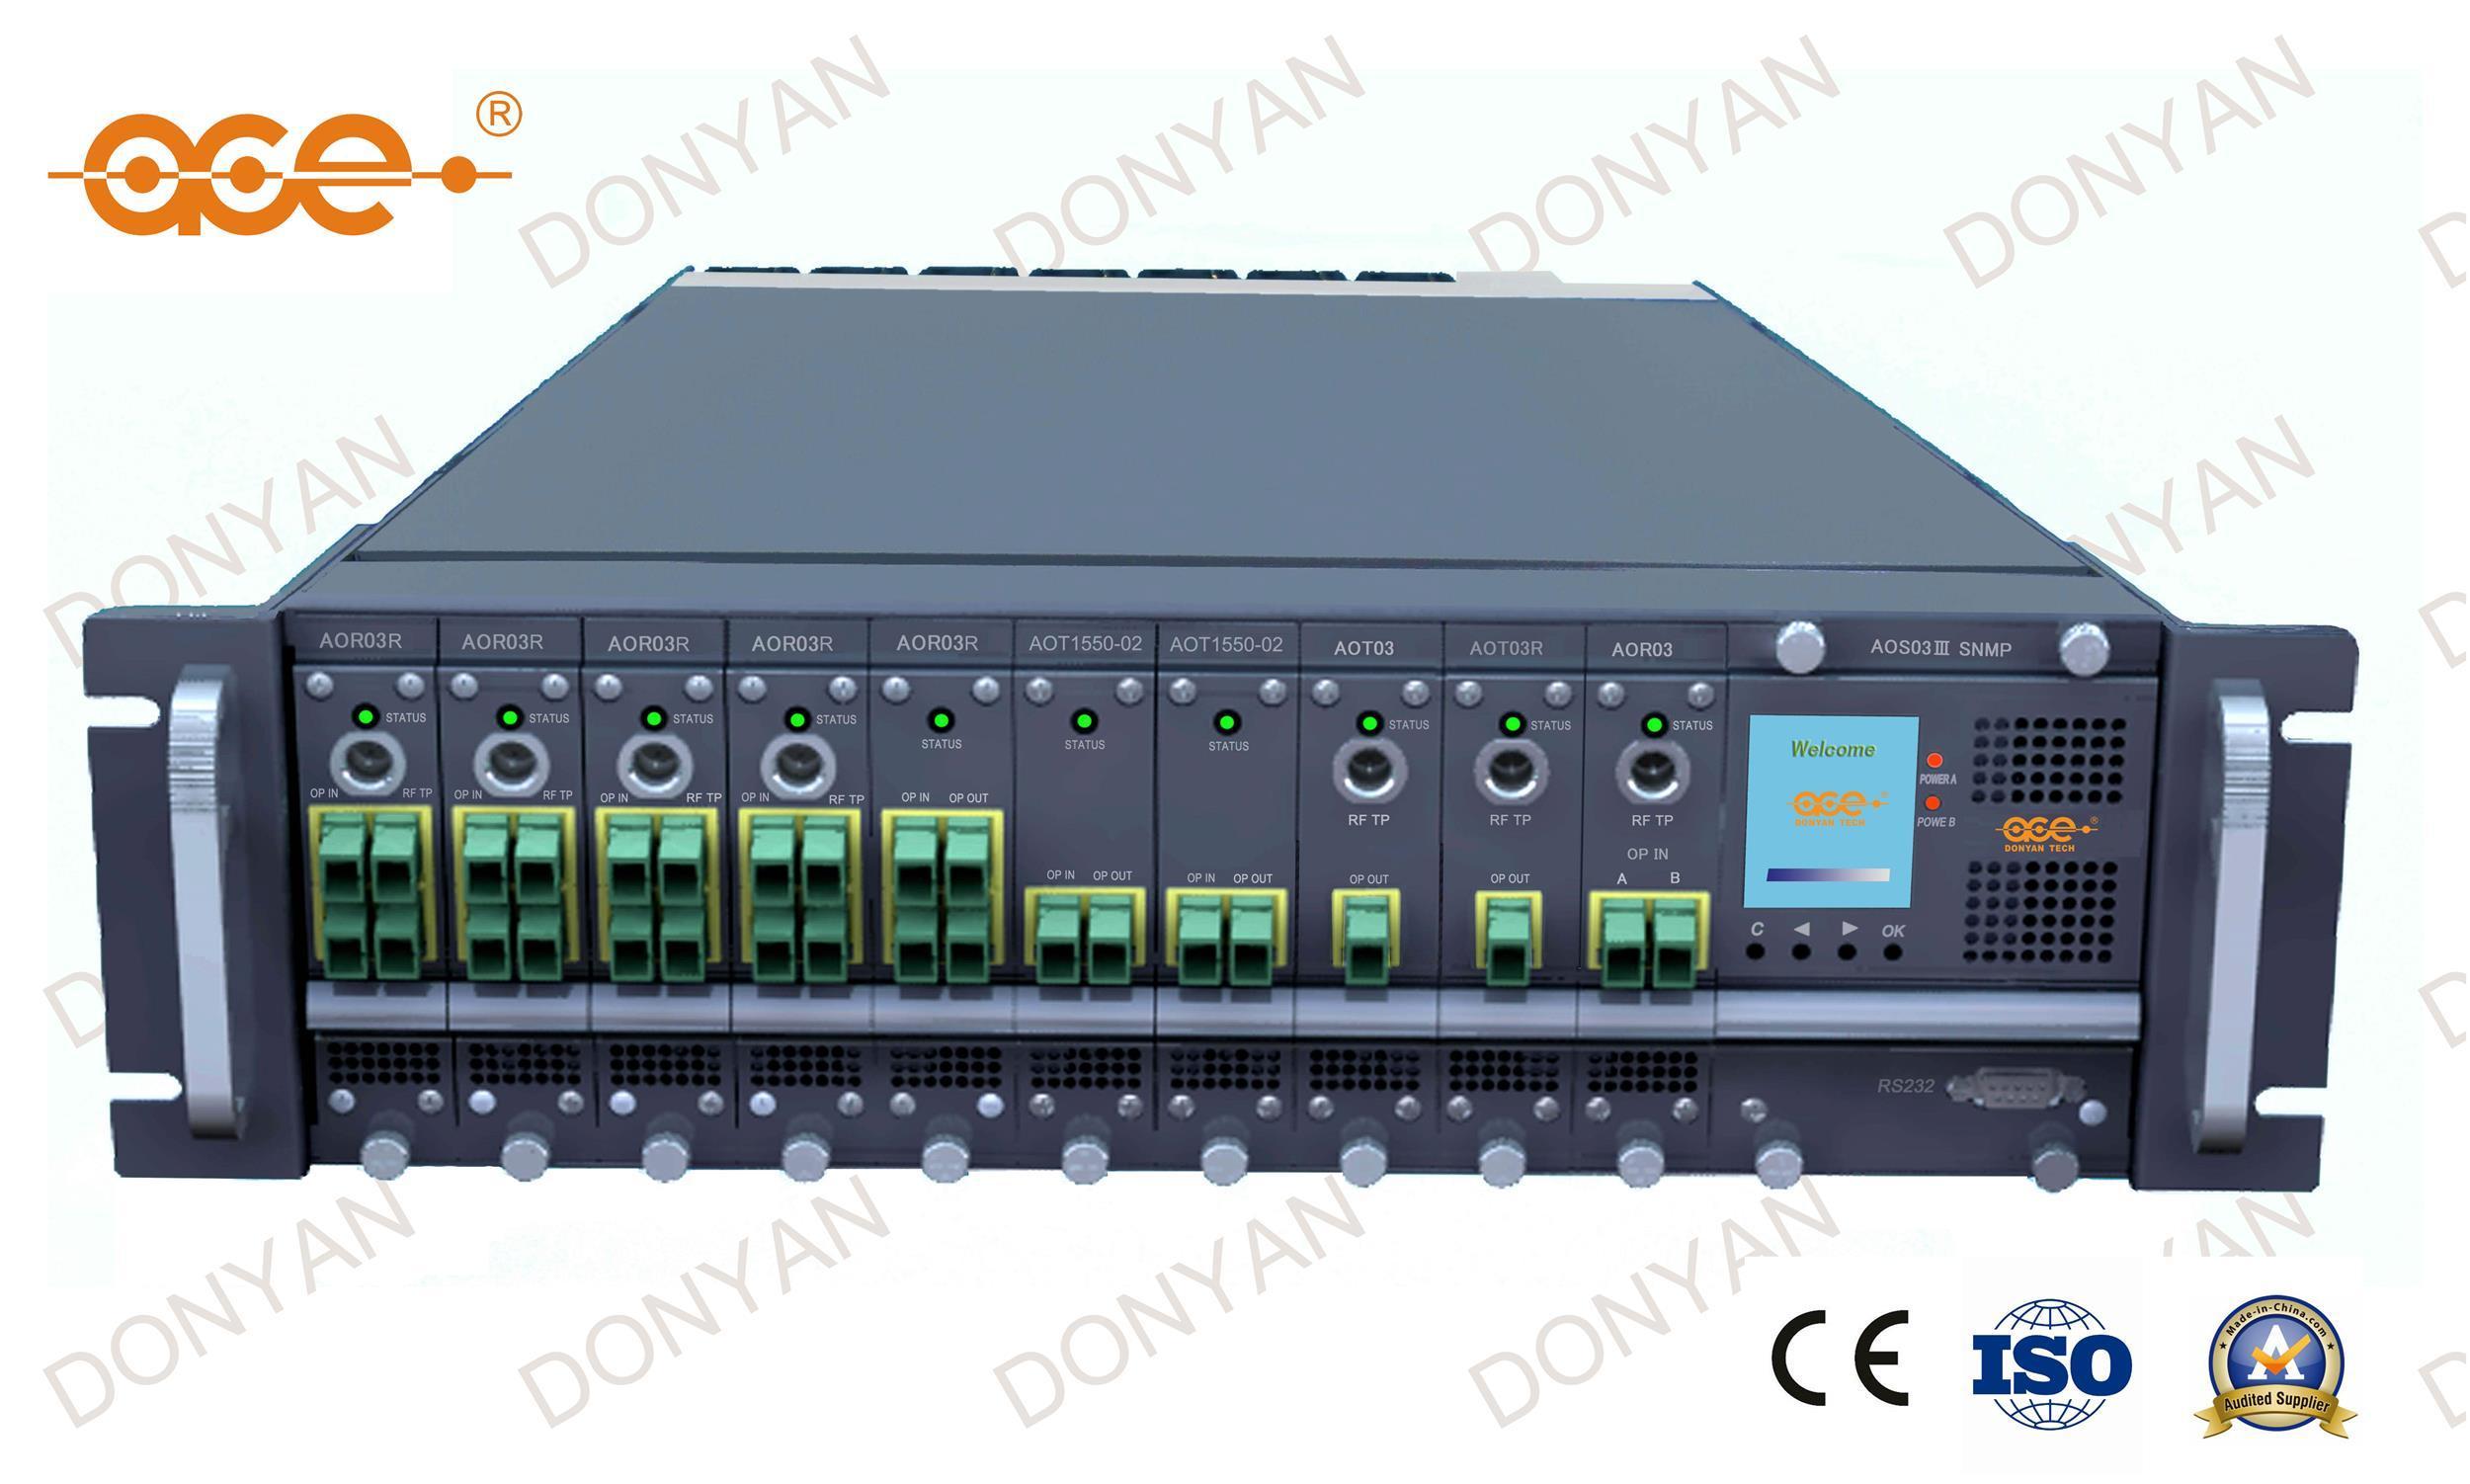 Aos03 Ace 3ru CATV Optical Transmission Platform